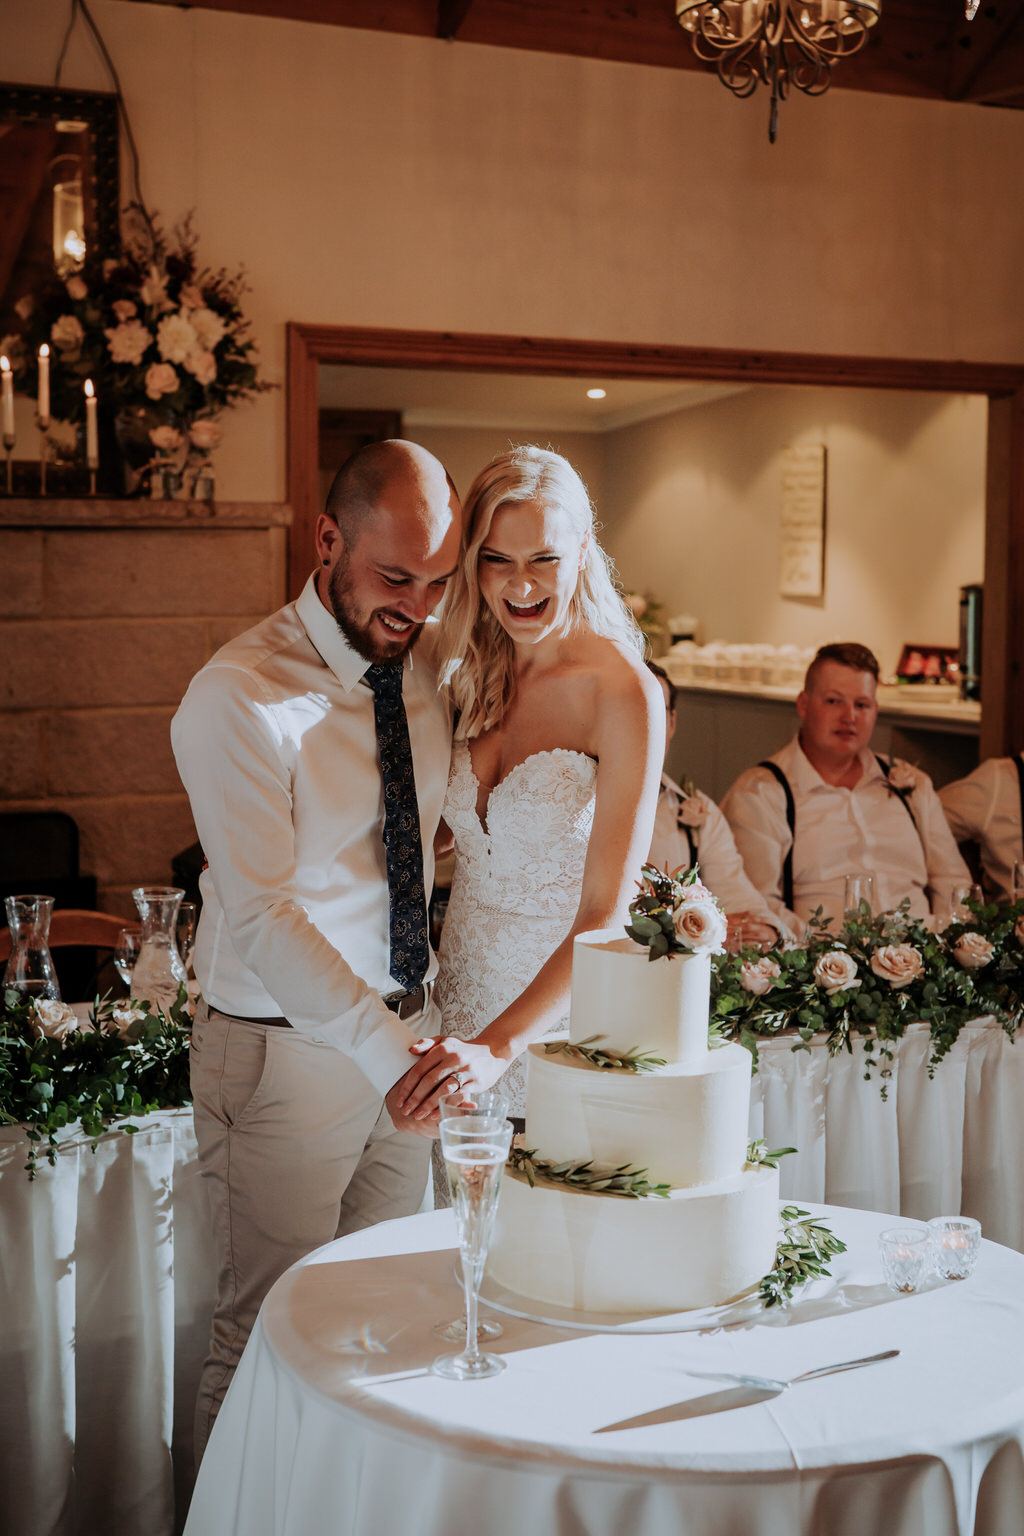 ava-me-photography-jade-simon-loxley-bellbird-hill-kurrajong-heights-wedding-939